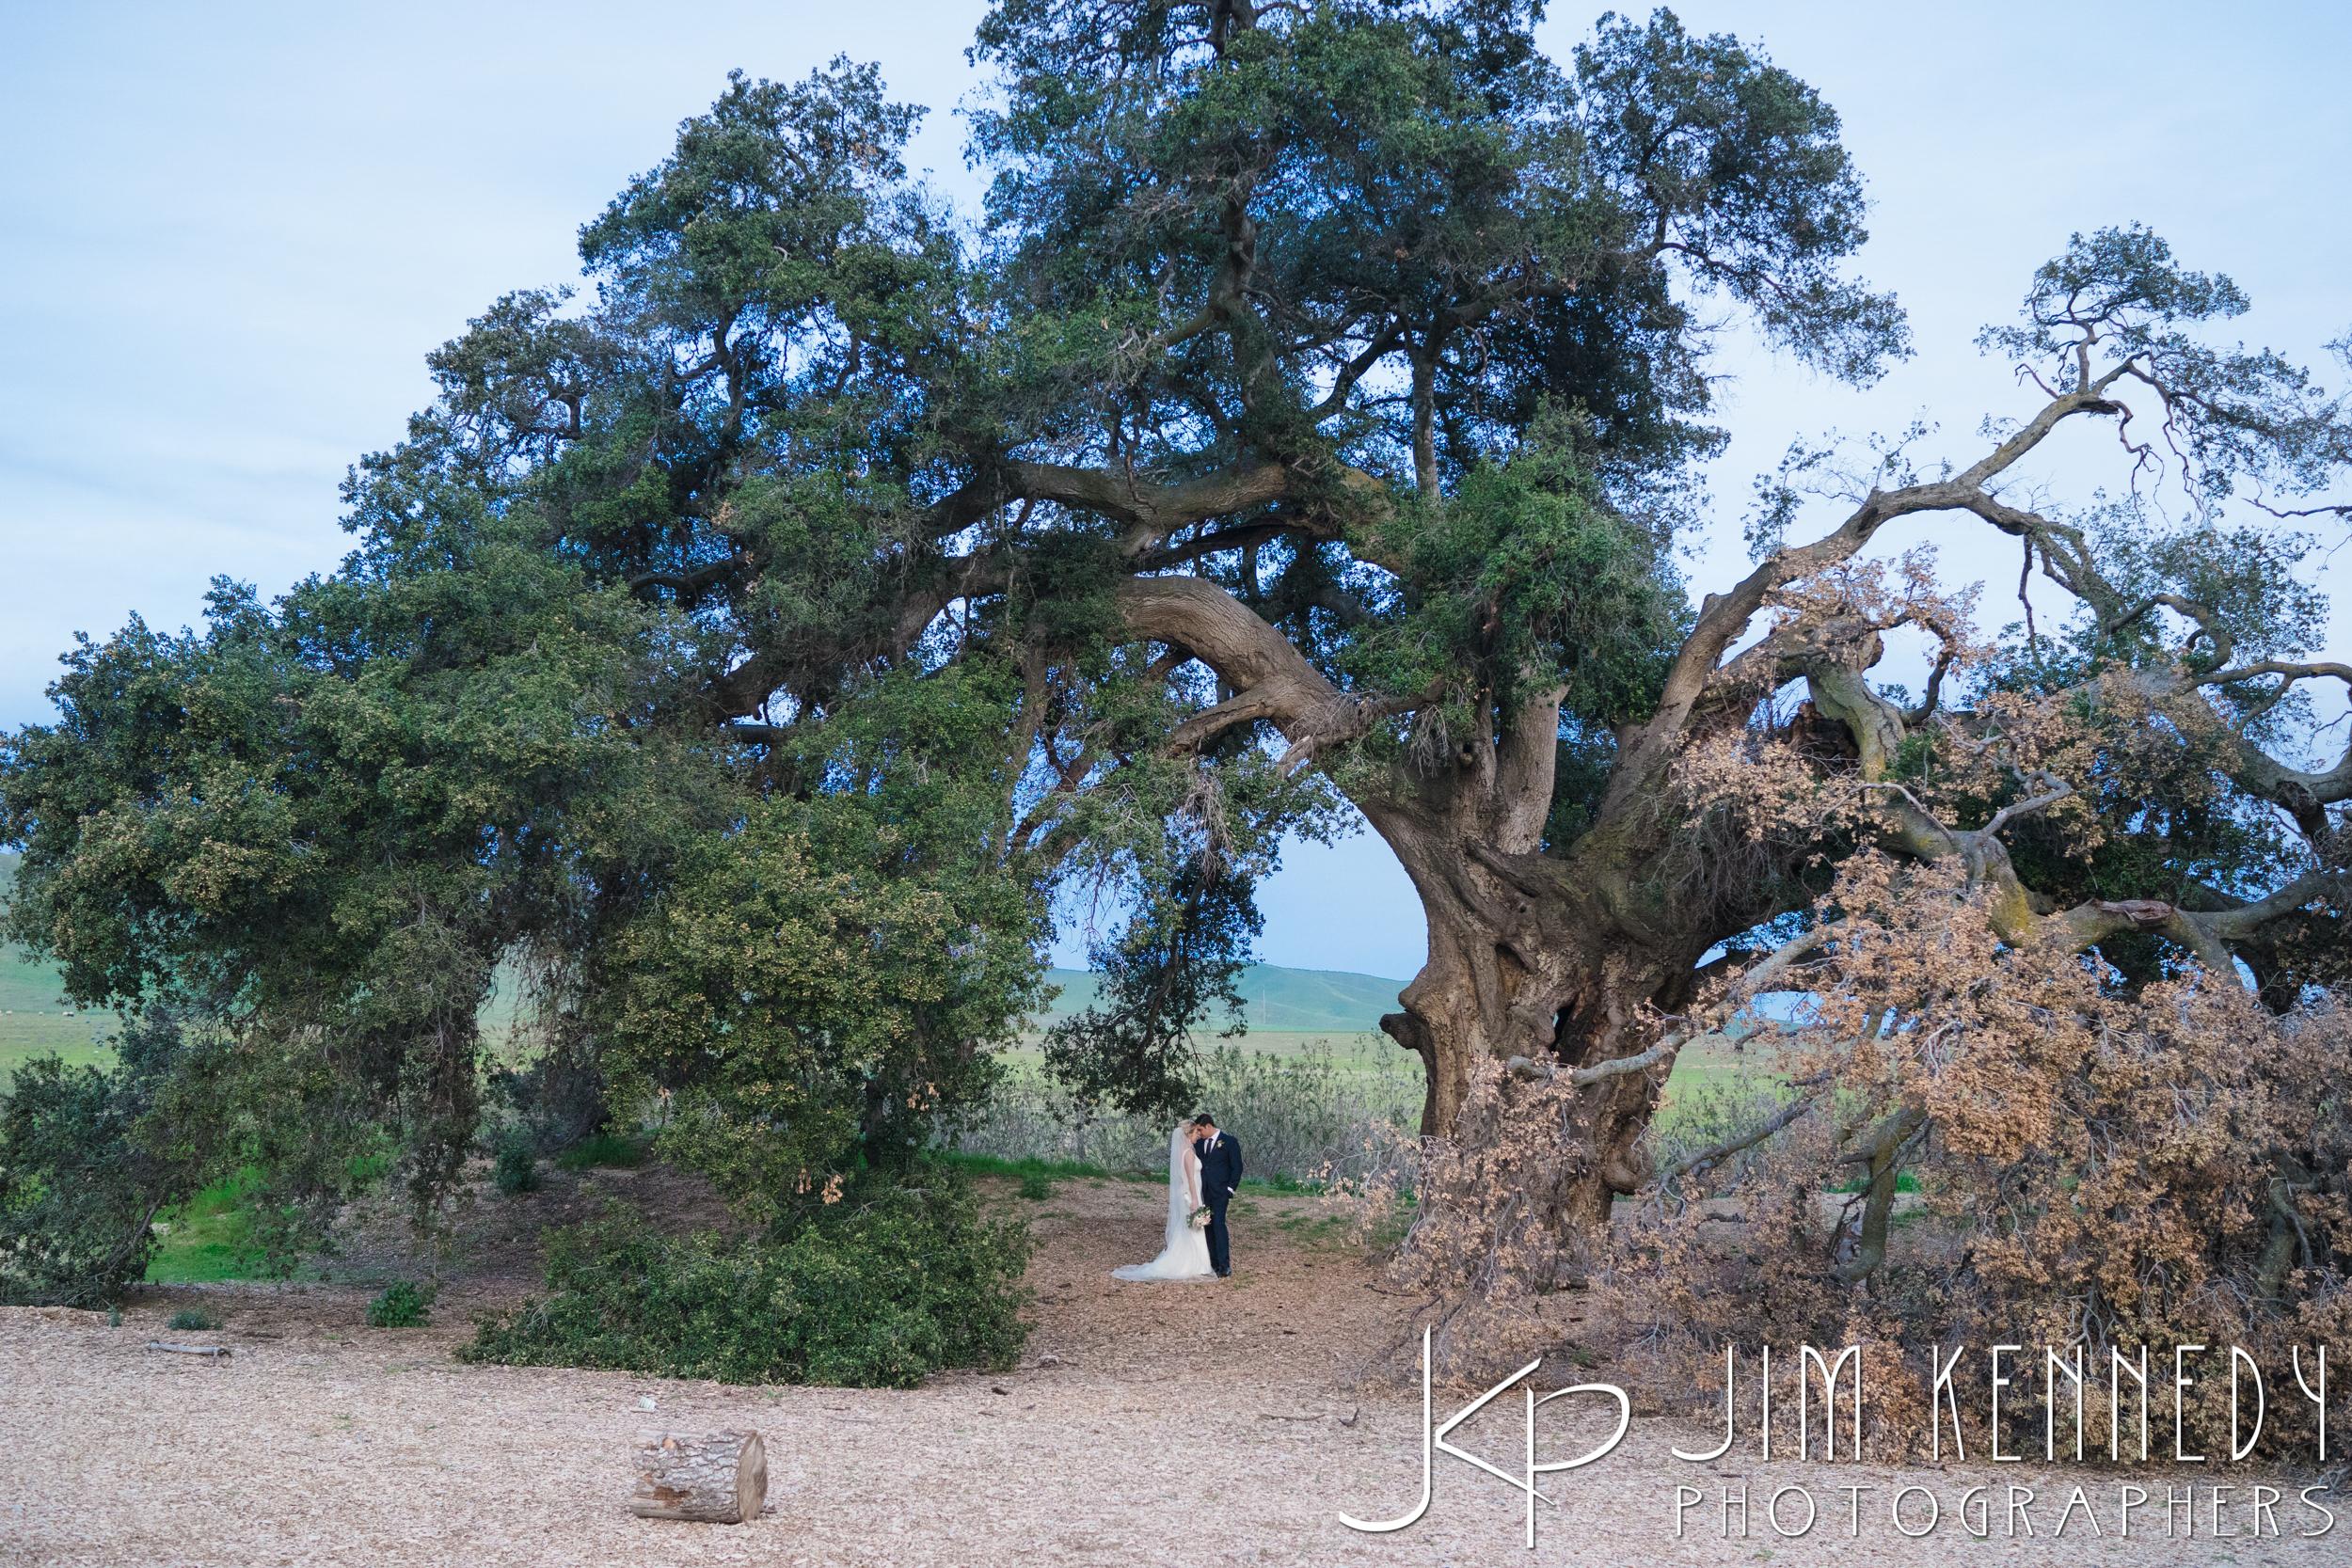 jim_kennedy_photographers_highland_springs_wedding_caitlyn_0148.jpg